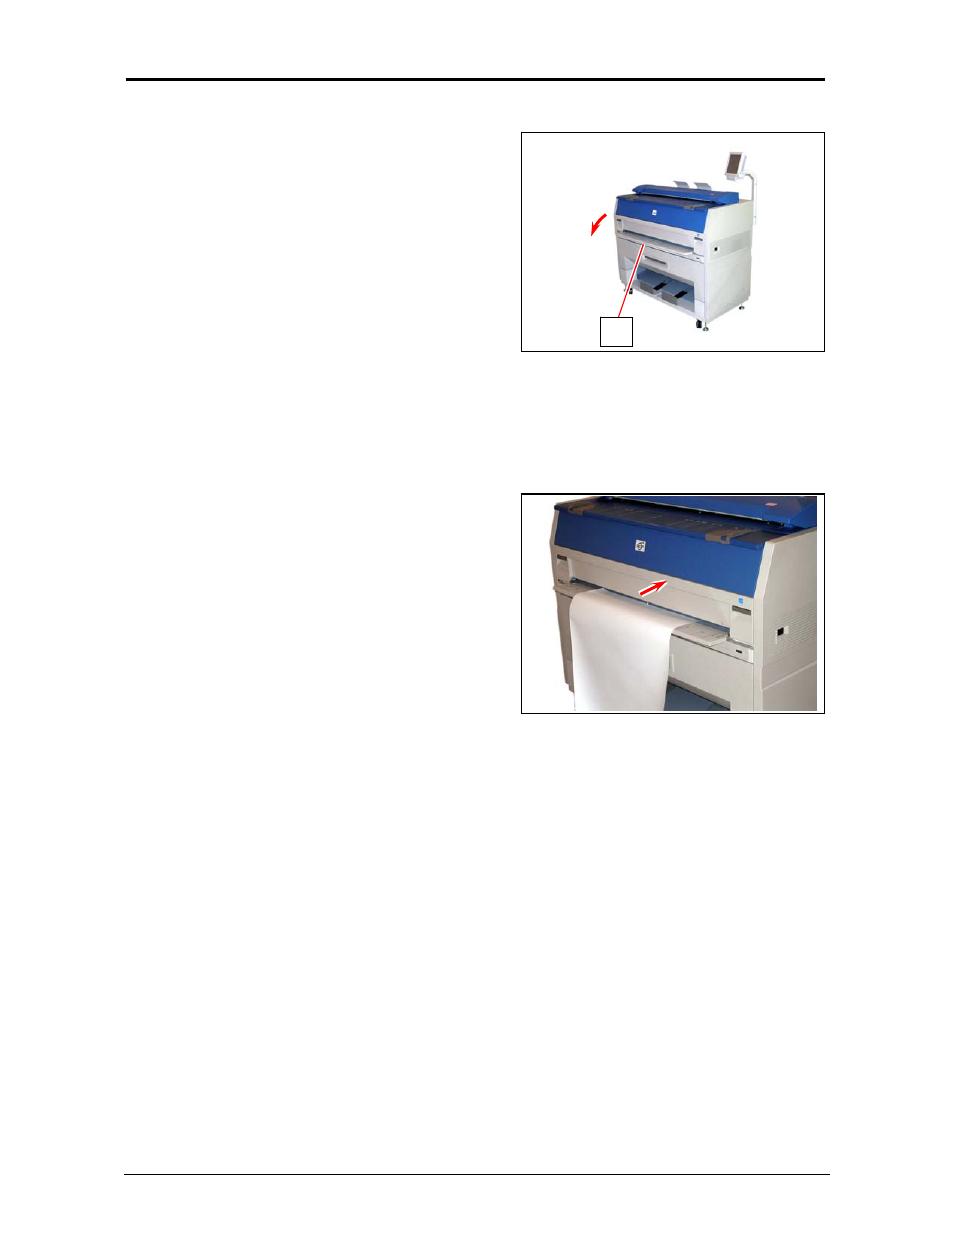 5 cut sheet media placement konica minolta kip 3100 user manual rh manualsdir com